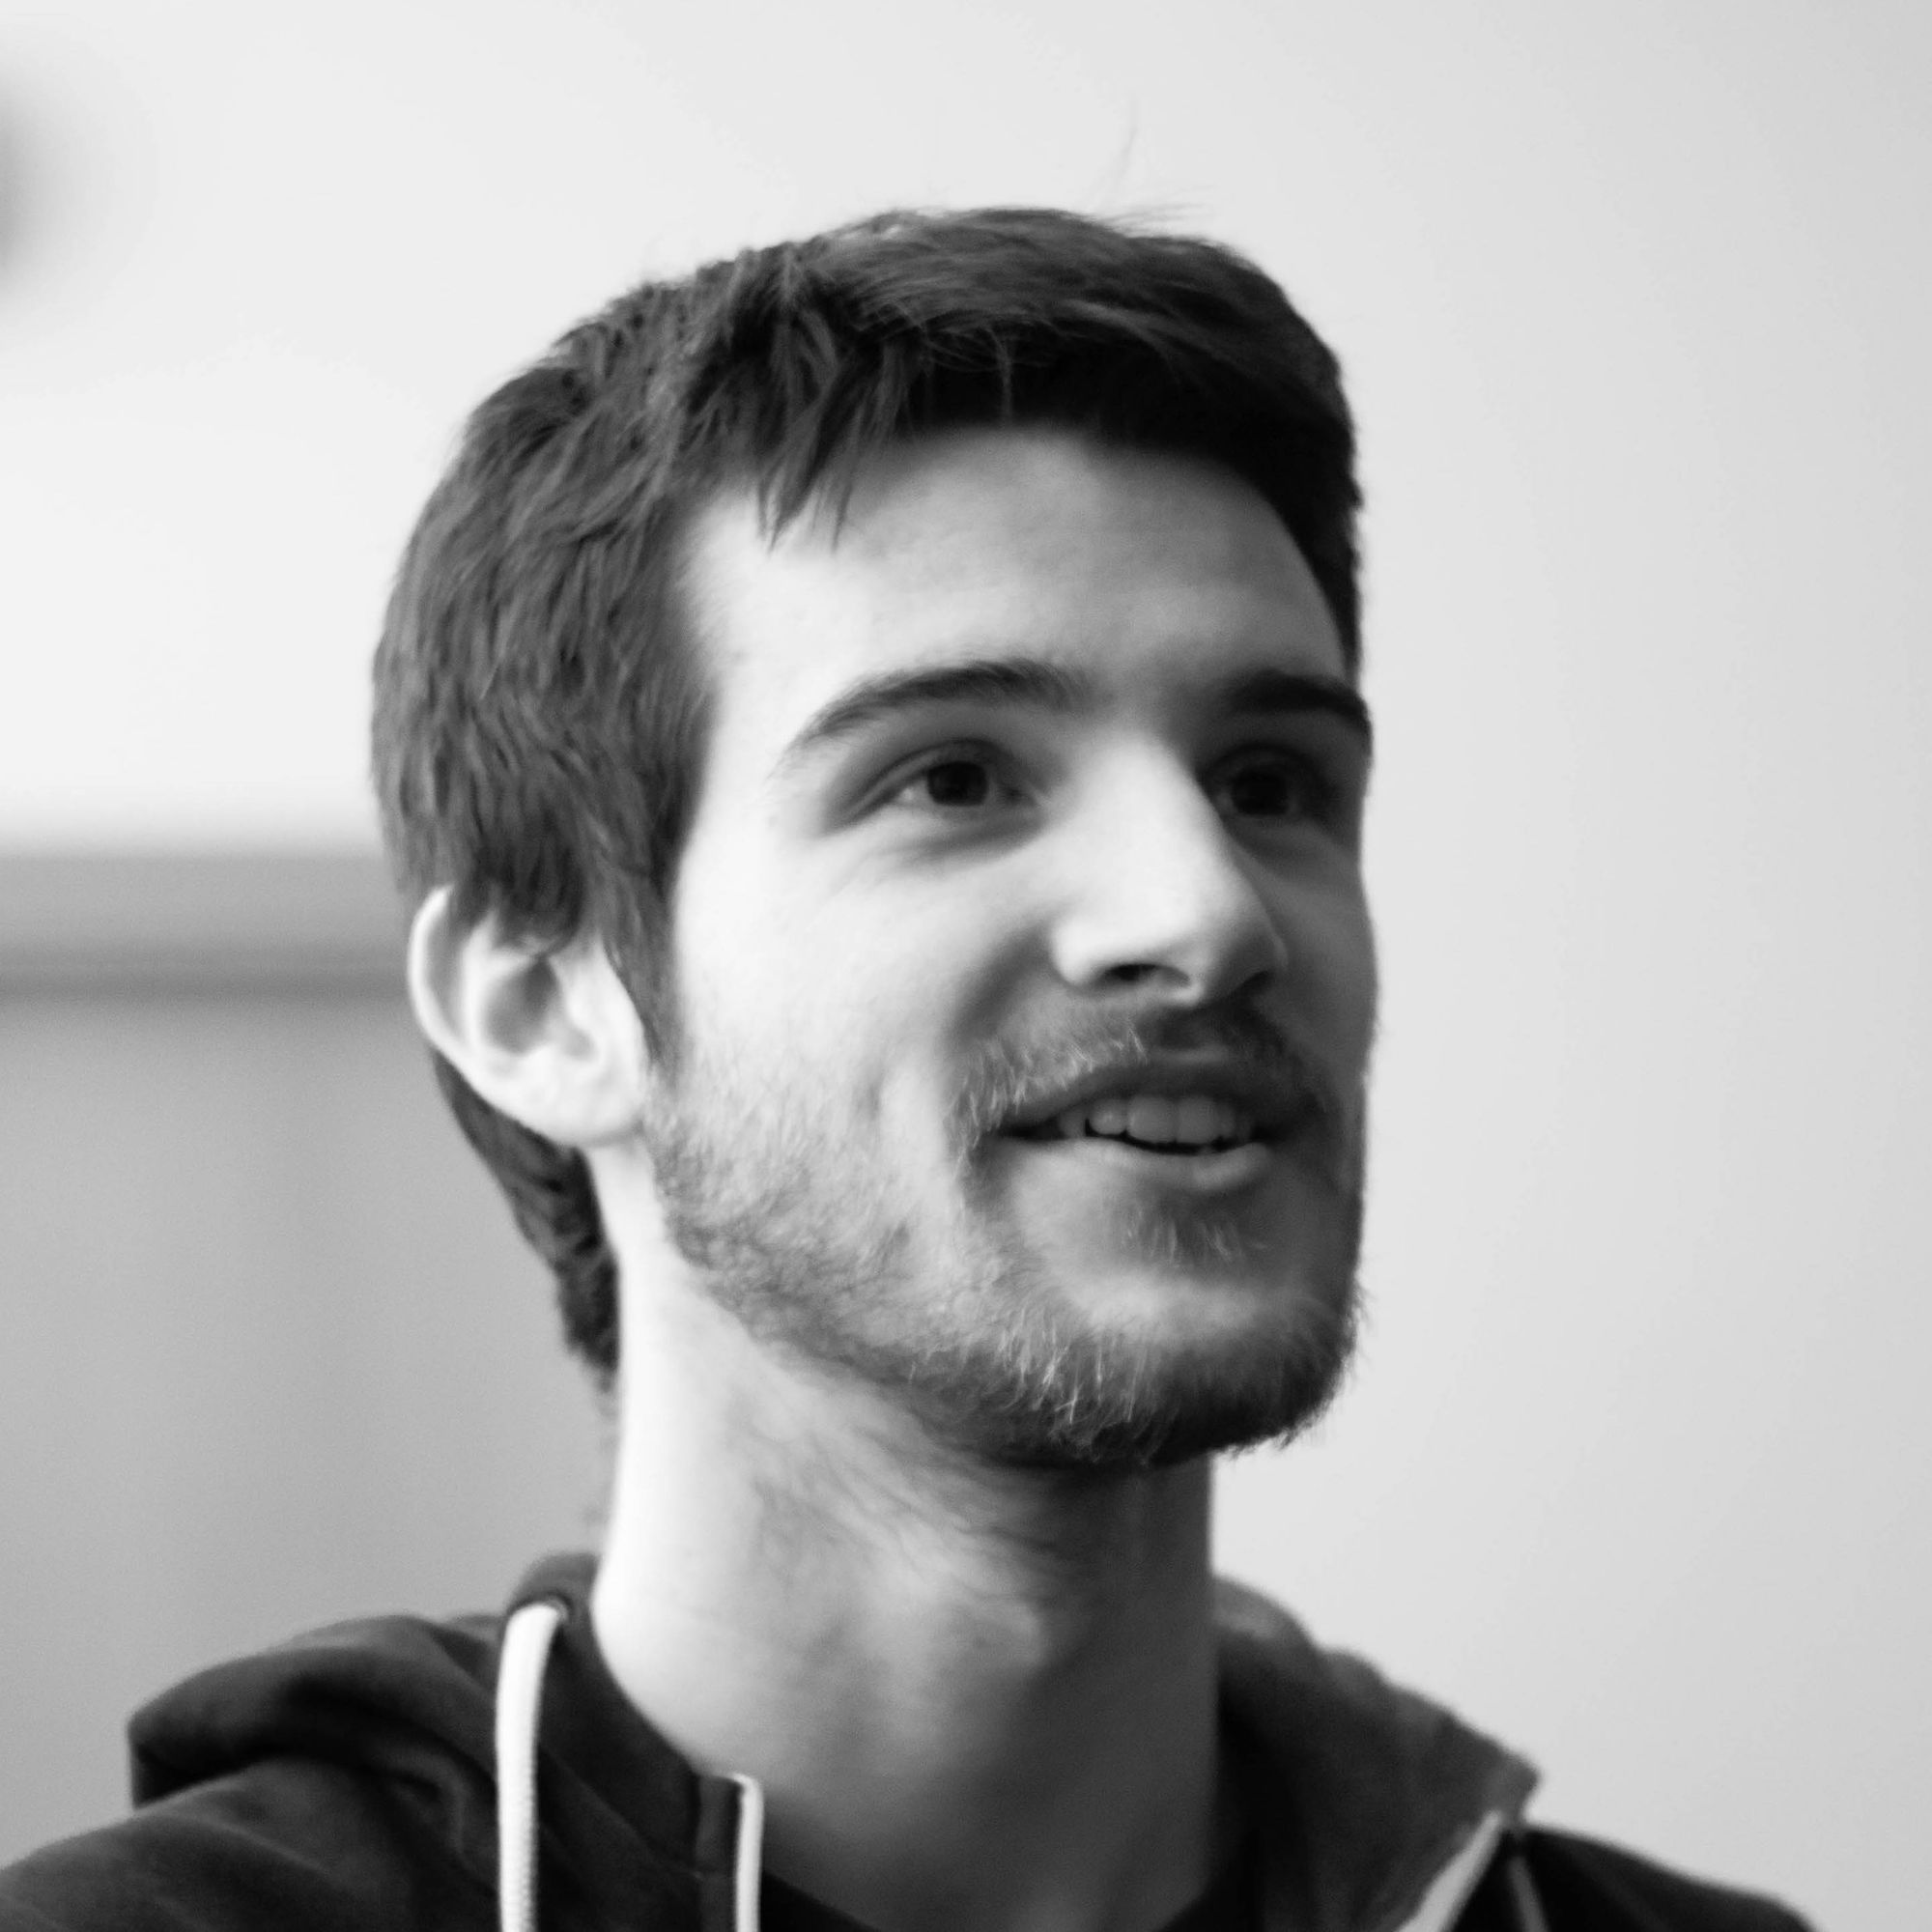 Adrien Zaganelli